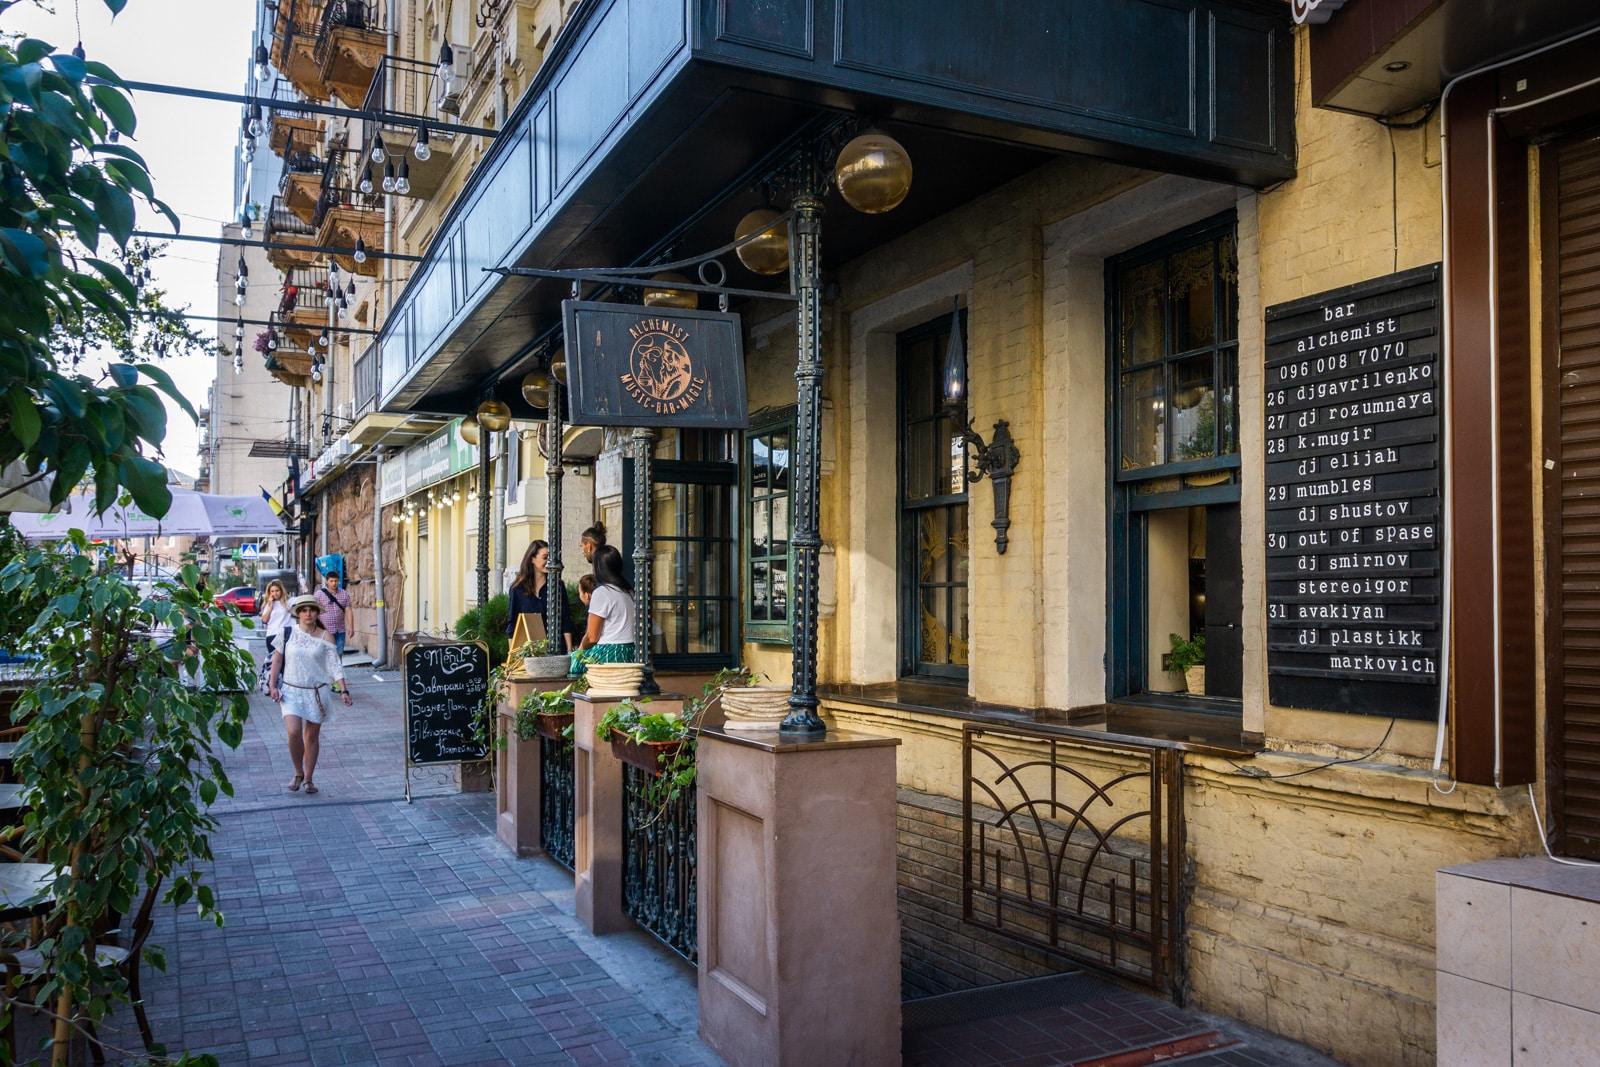 Bar de cócteles alquimista en Kiev, Ucrania